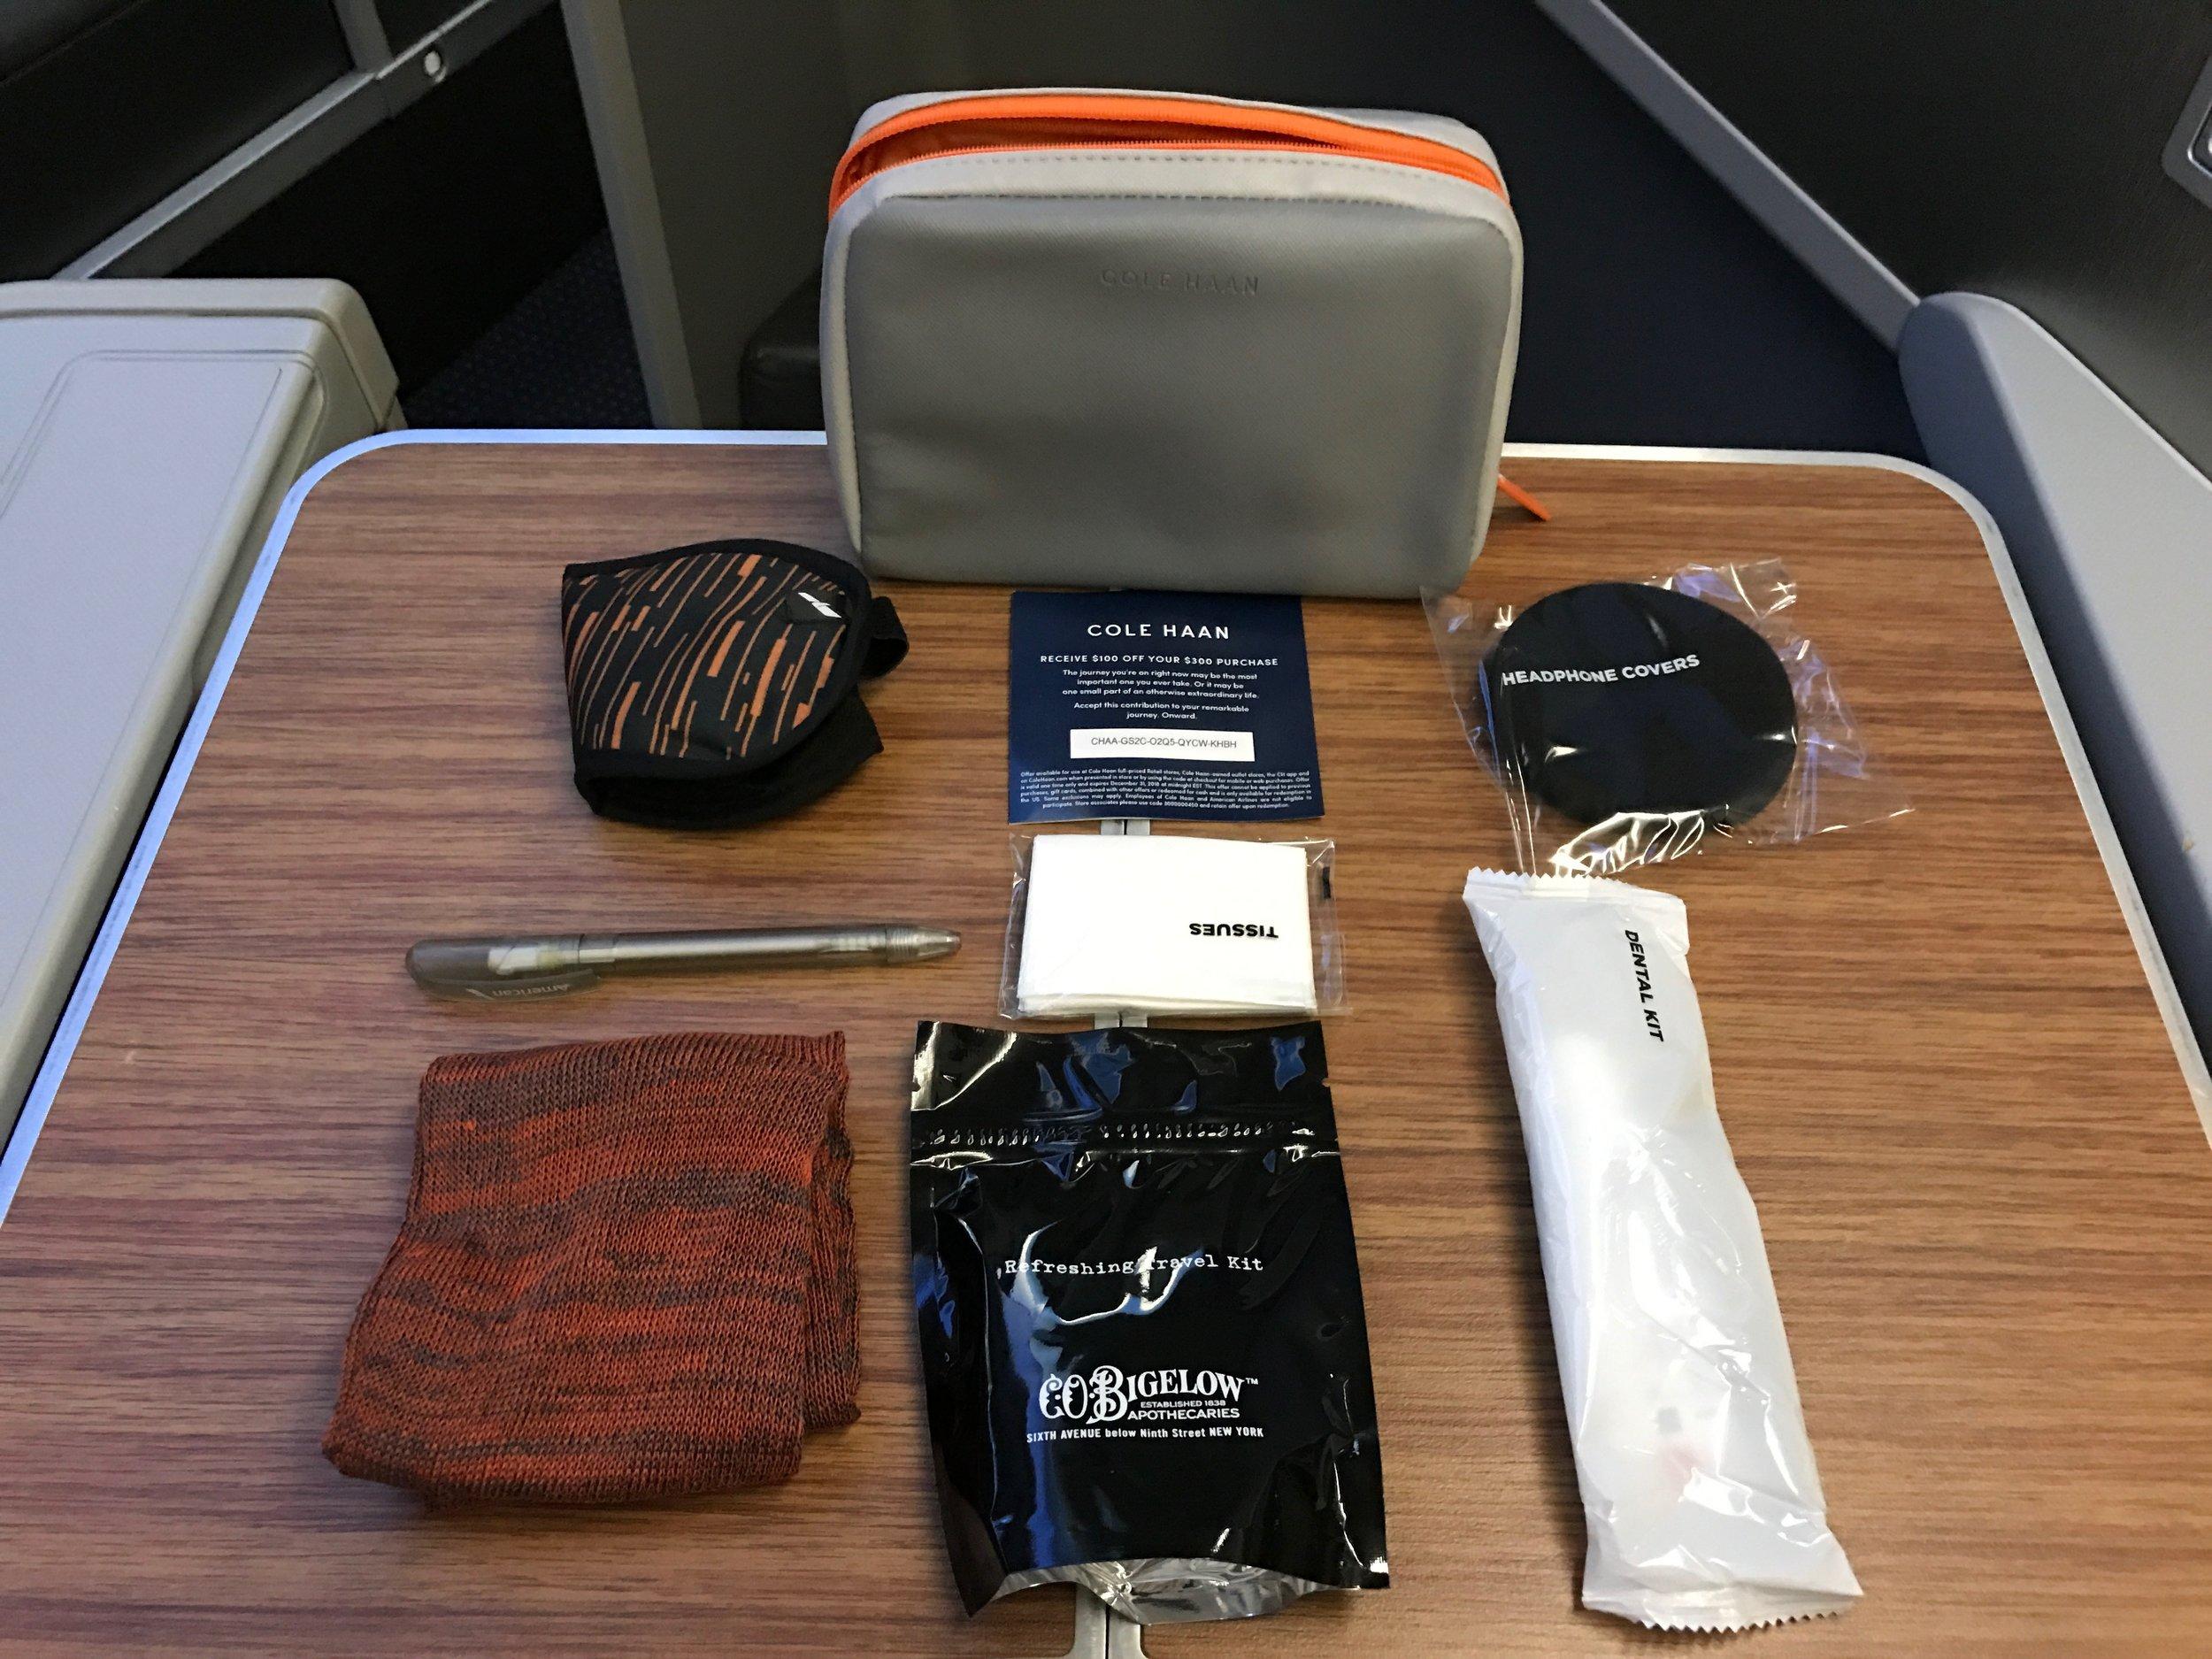 AA business class amenity kit